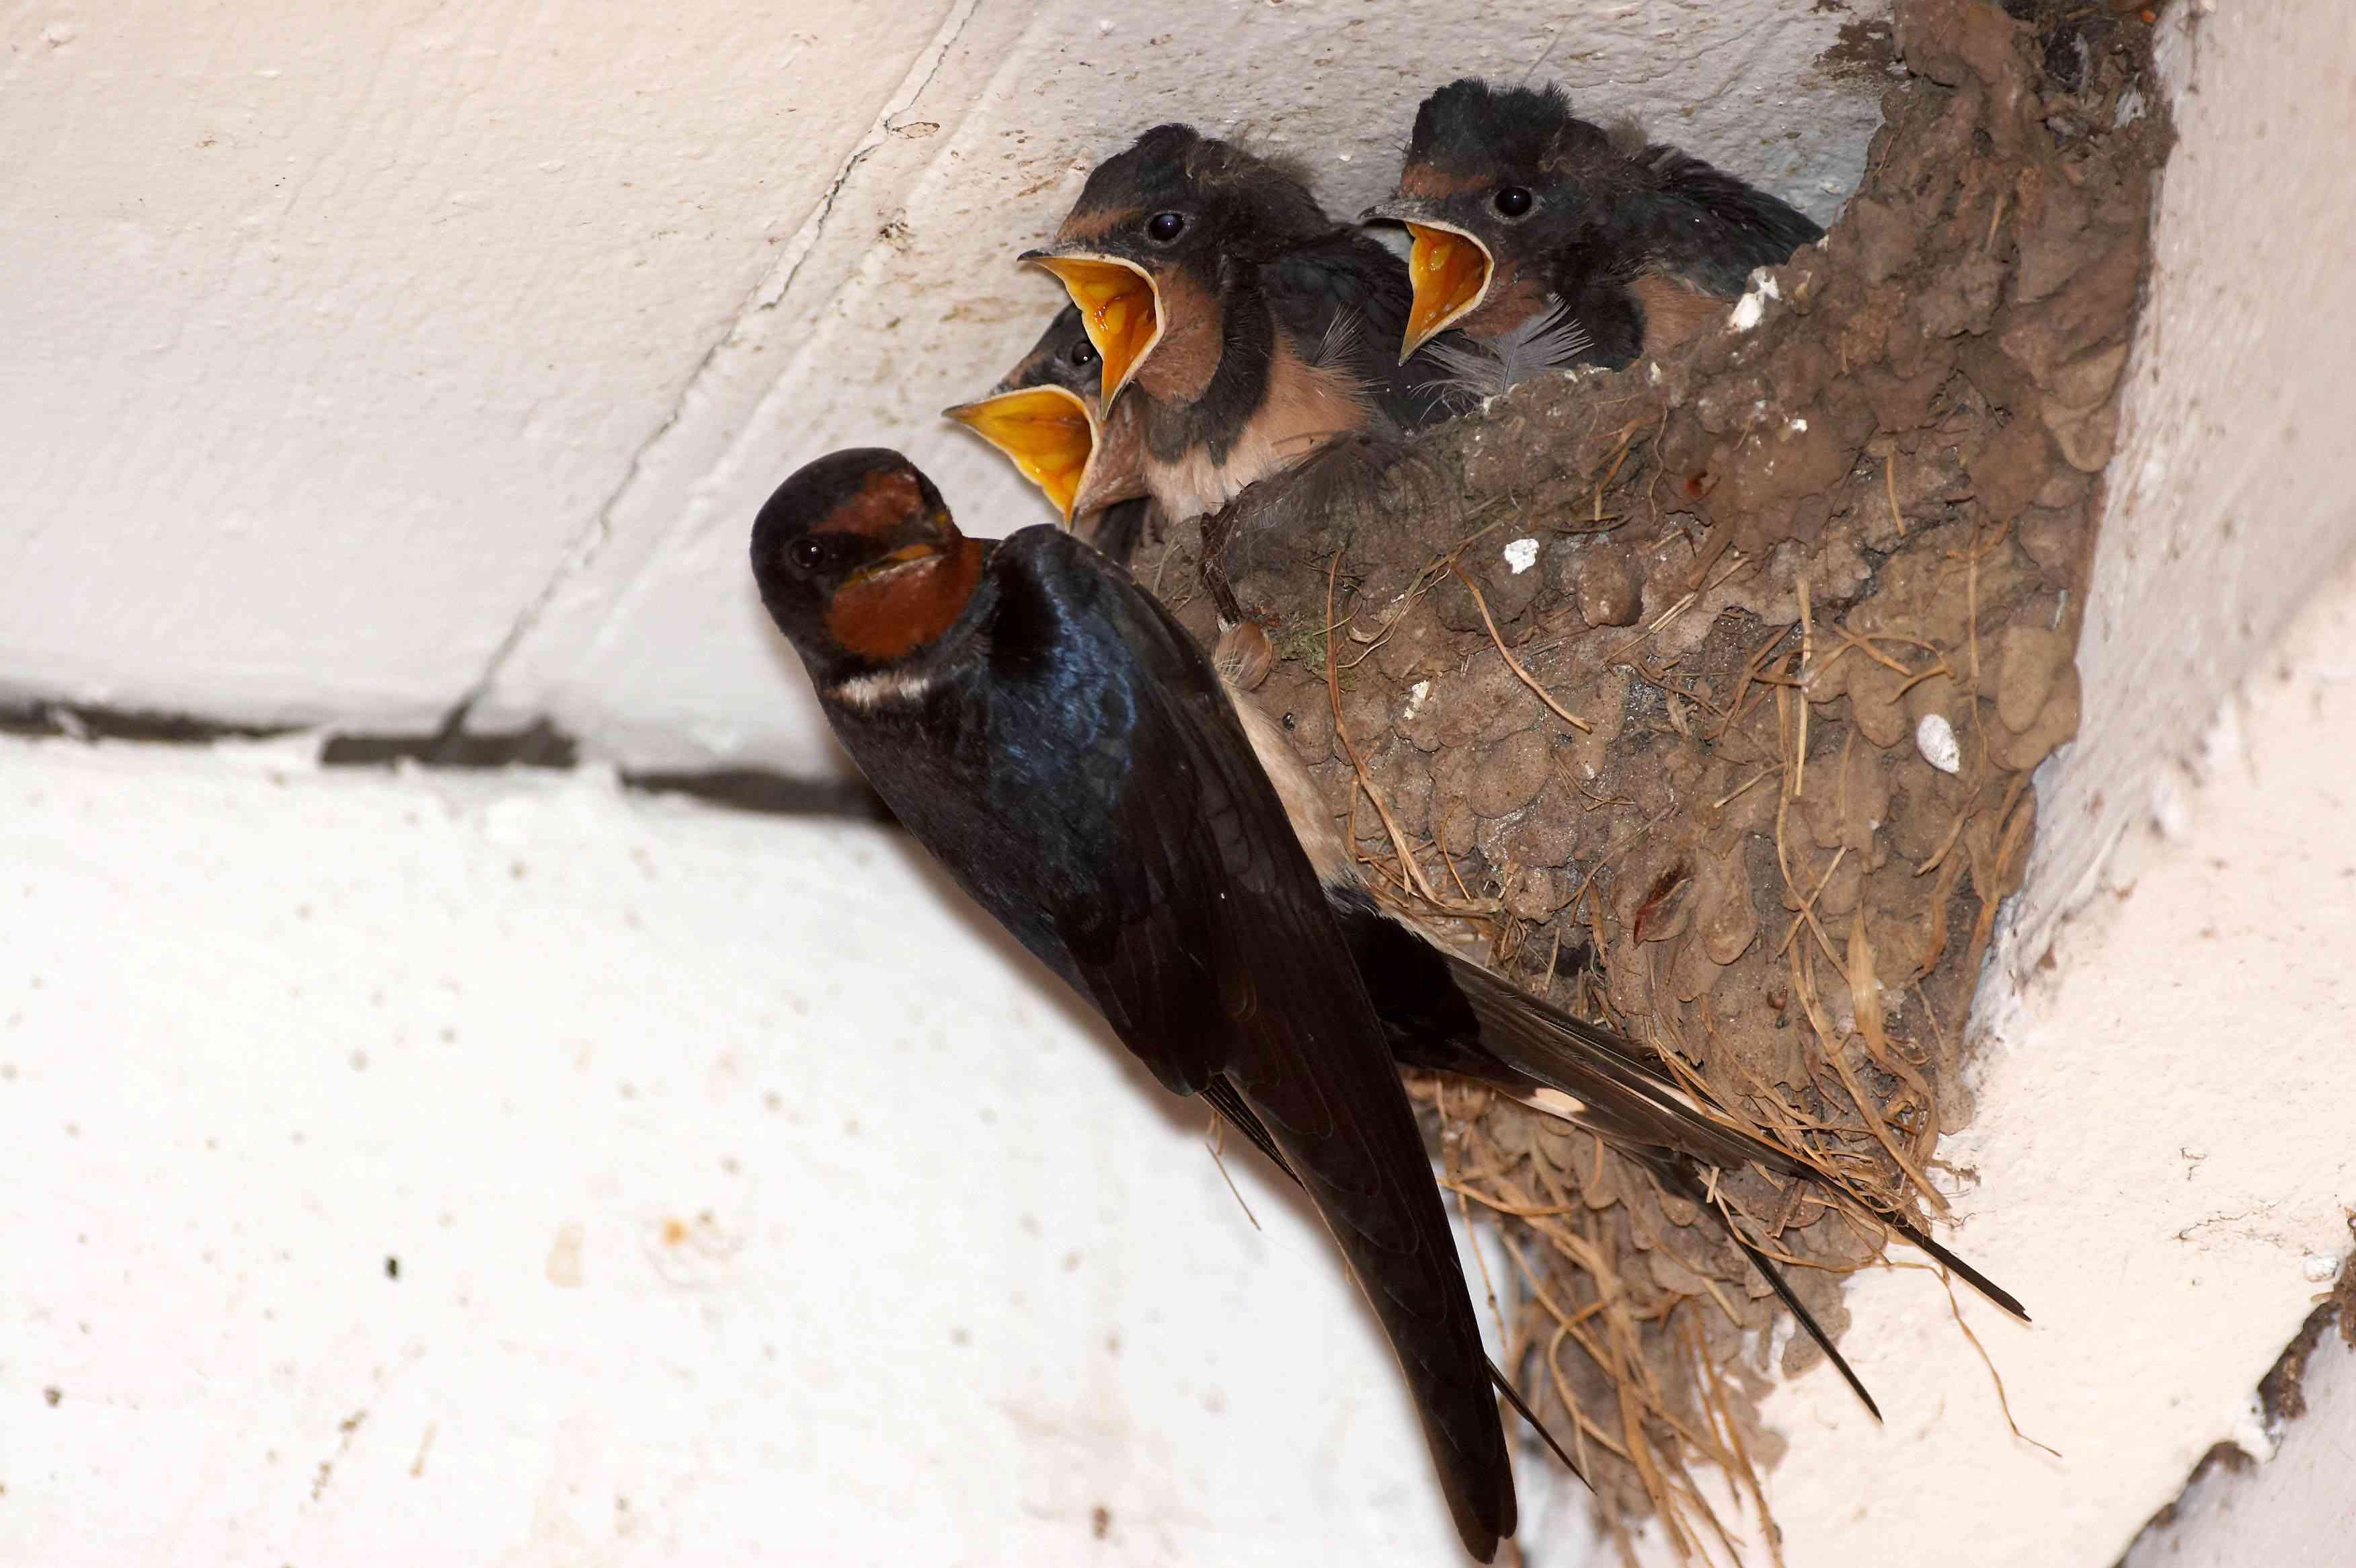 Barn swallow feeds baby birds in a nest